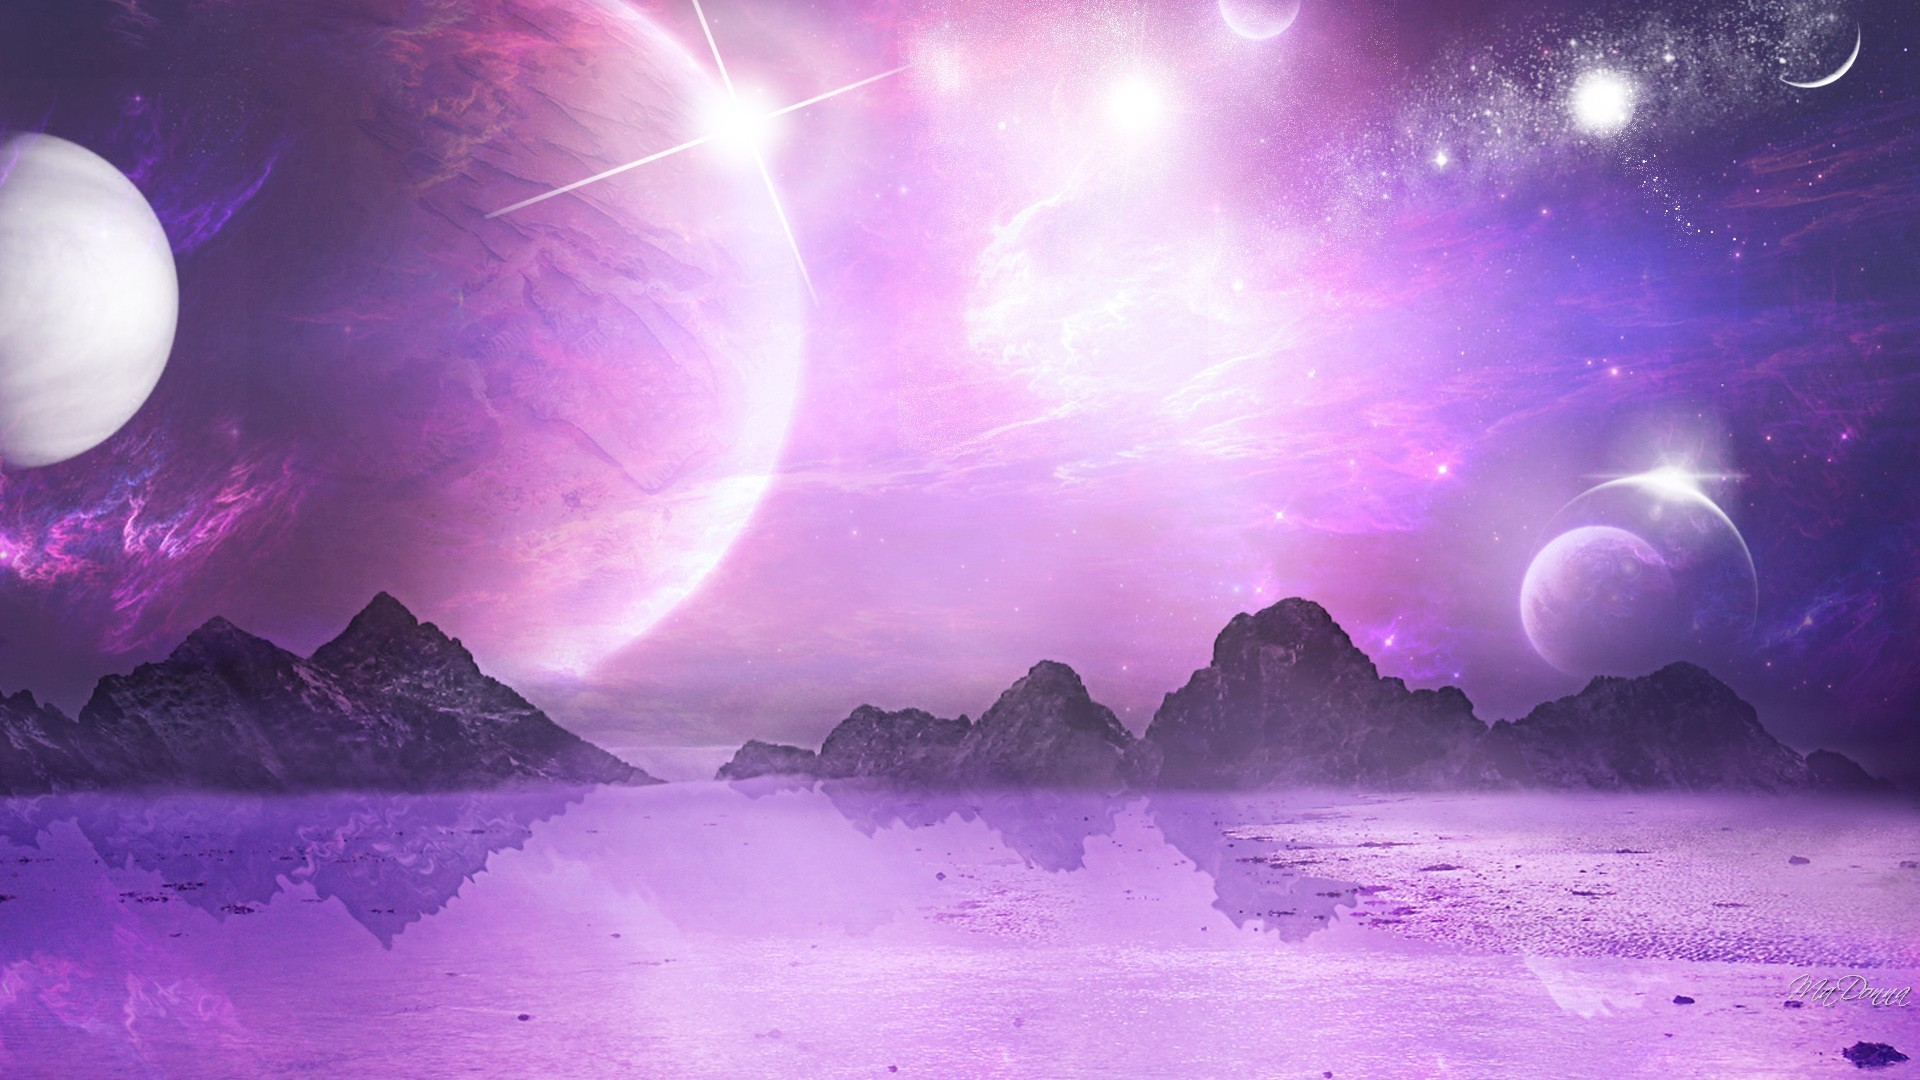 Planets Stars Mountains Sky Lavender Moon Purple Space HD Desktop Detail